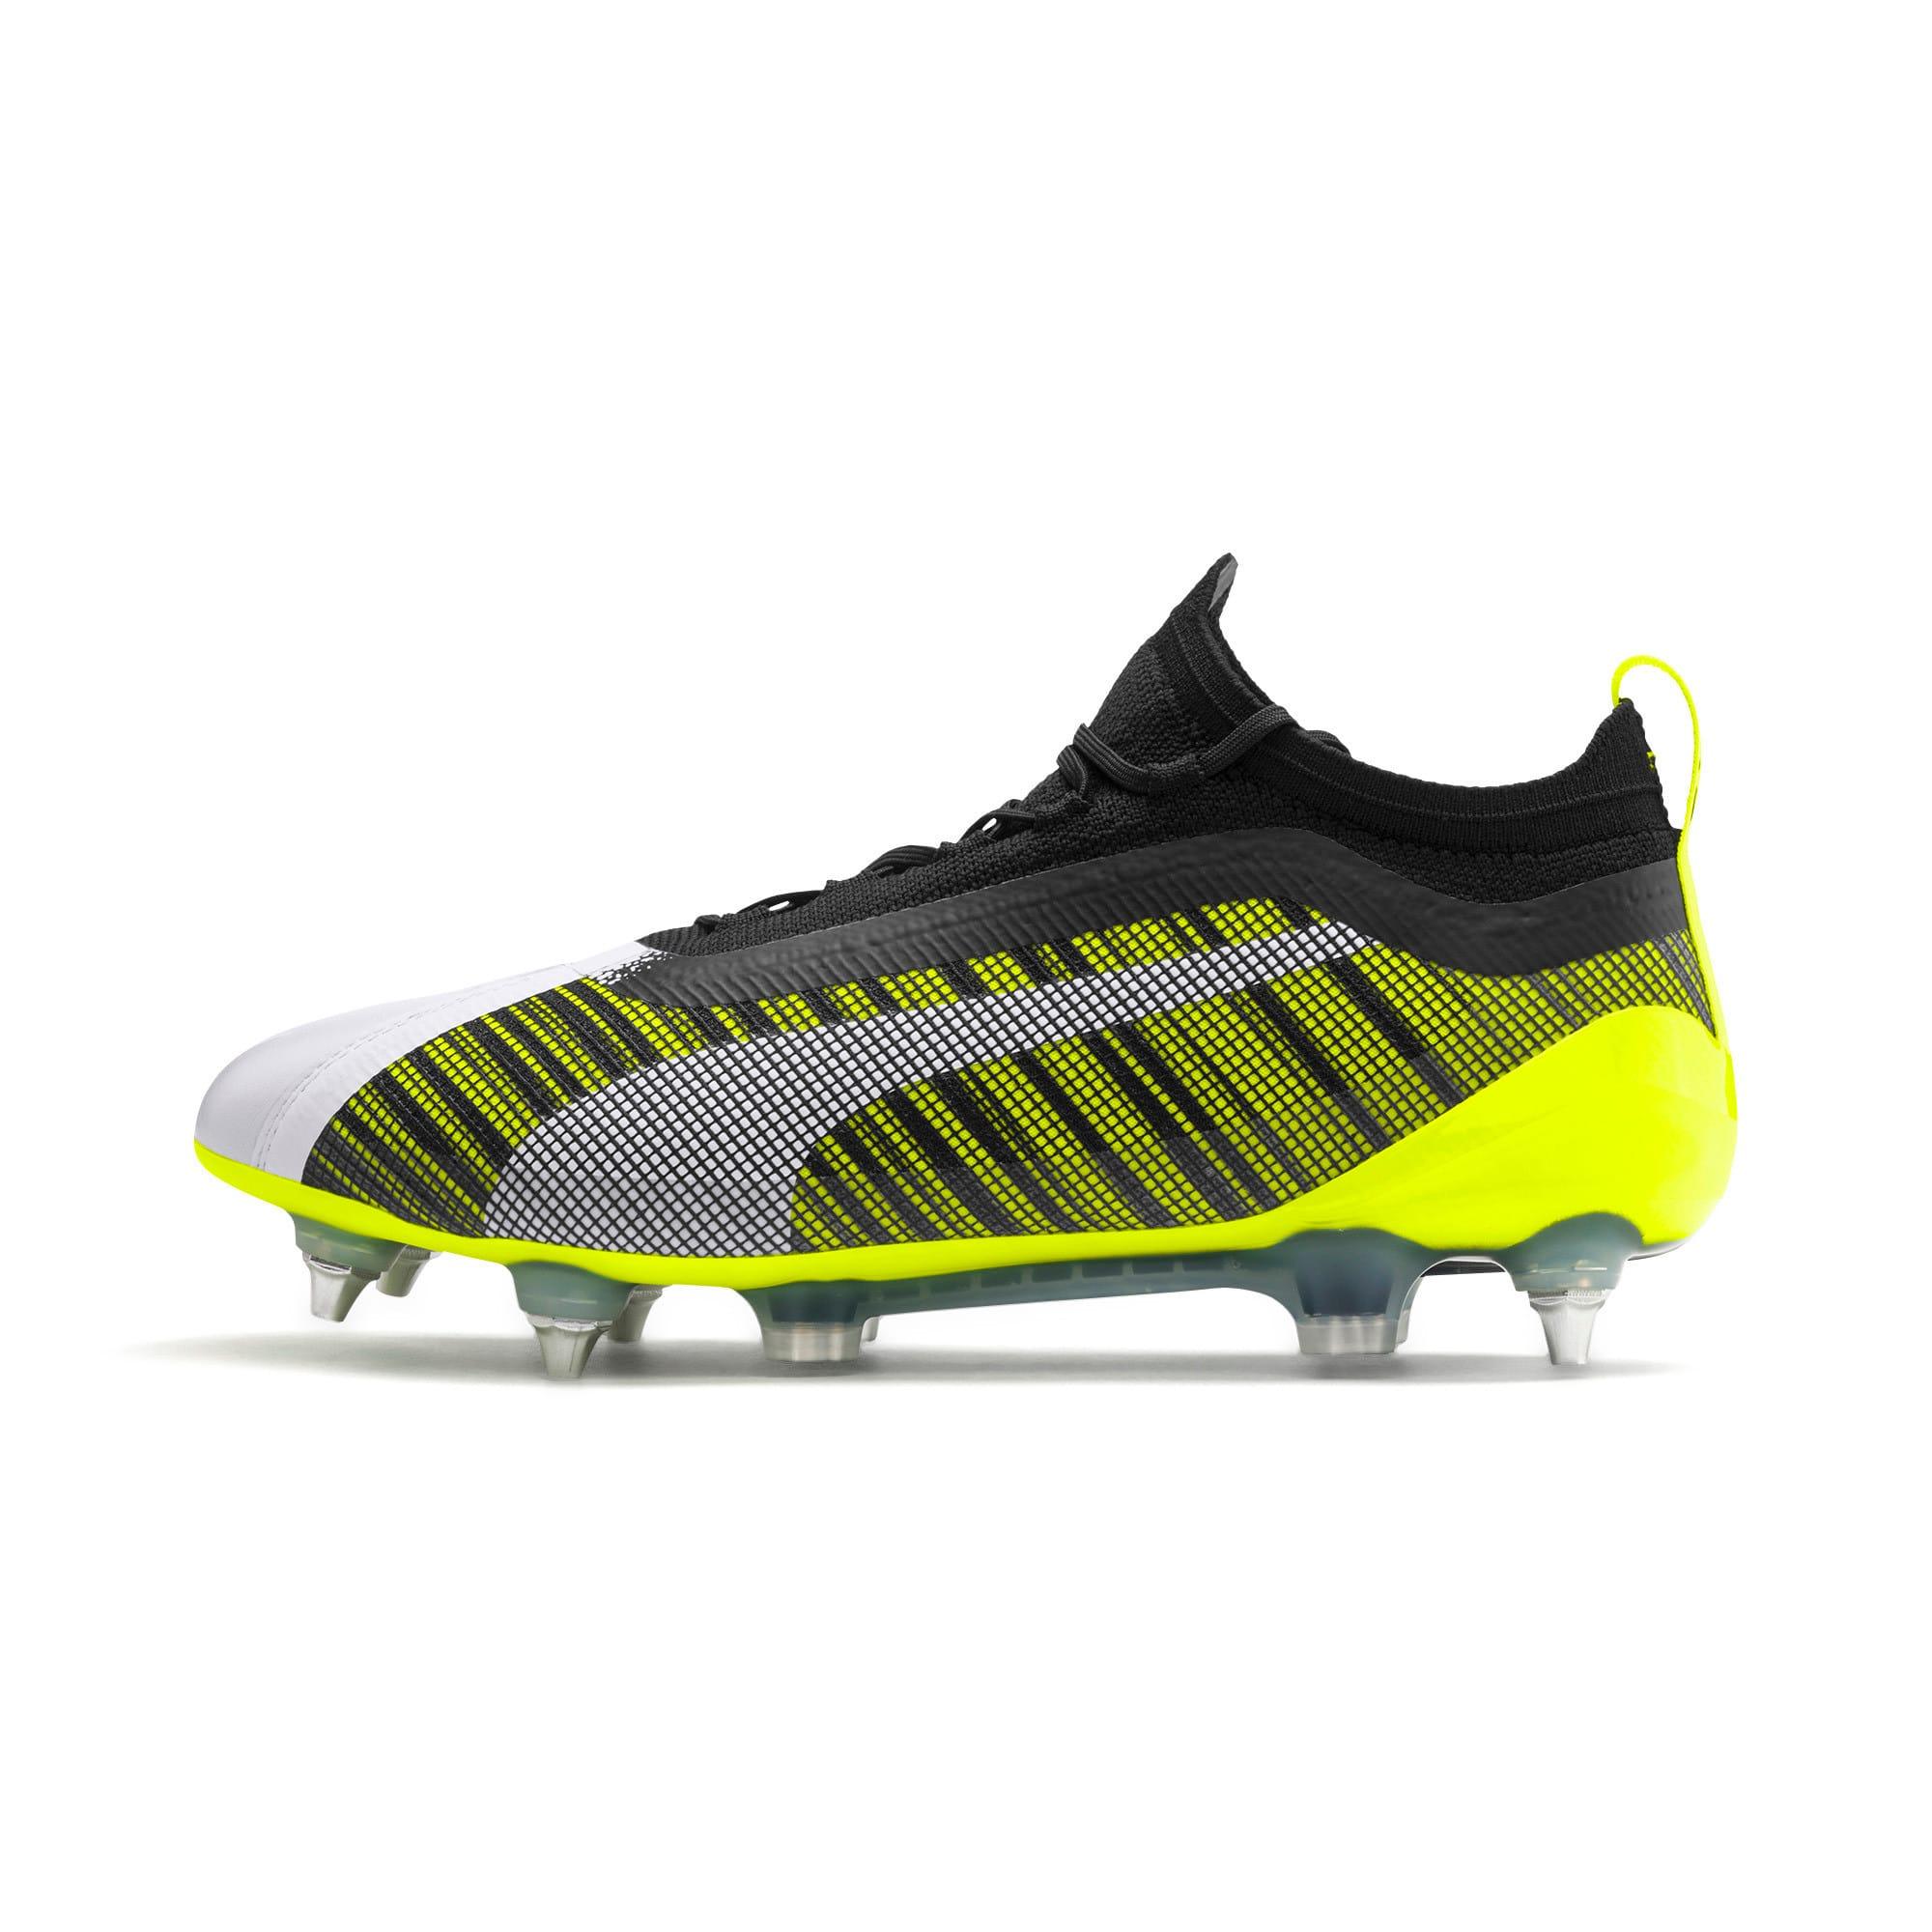 Thumbnail 1 of PUMA ONE 5.1 MxSG Football Boots, White-Black-Yellow Alert, medium